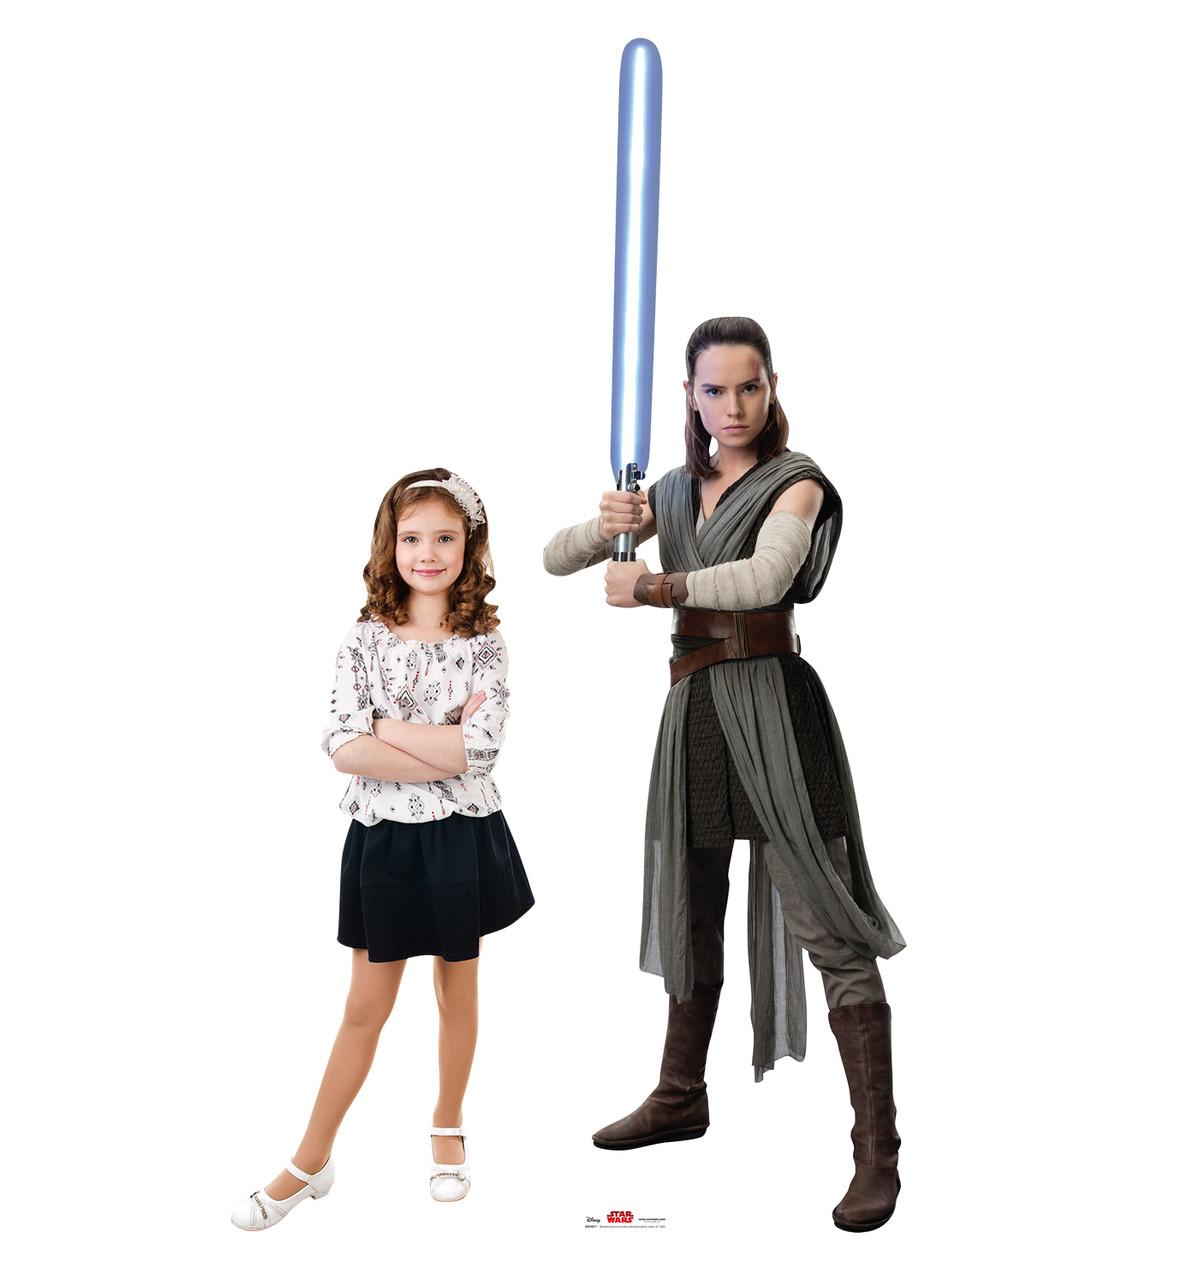 Rey - Star Wars: The Last Jedi Life-Size Cardboard Cutout 3